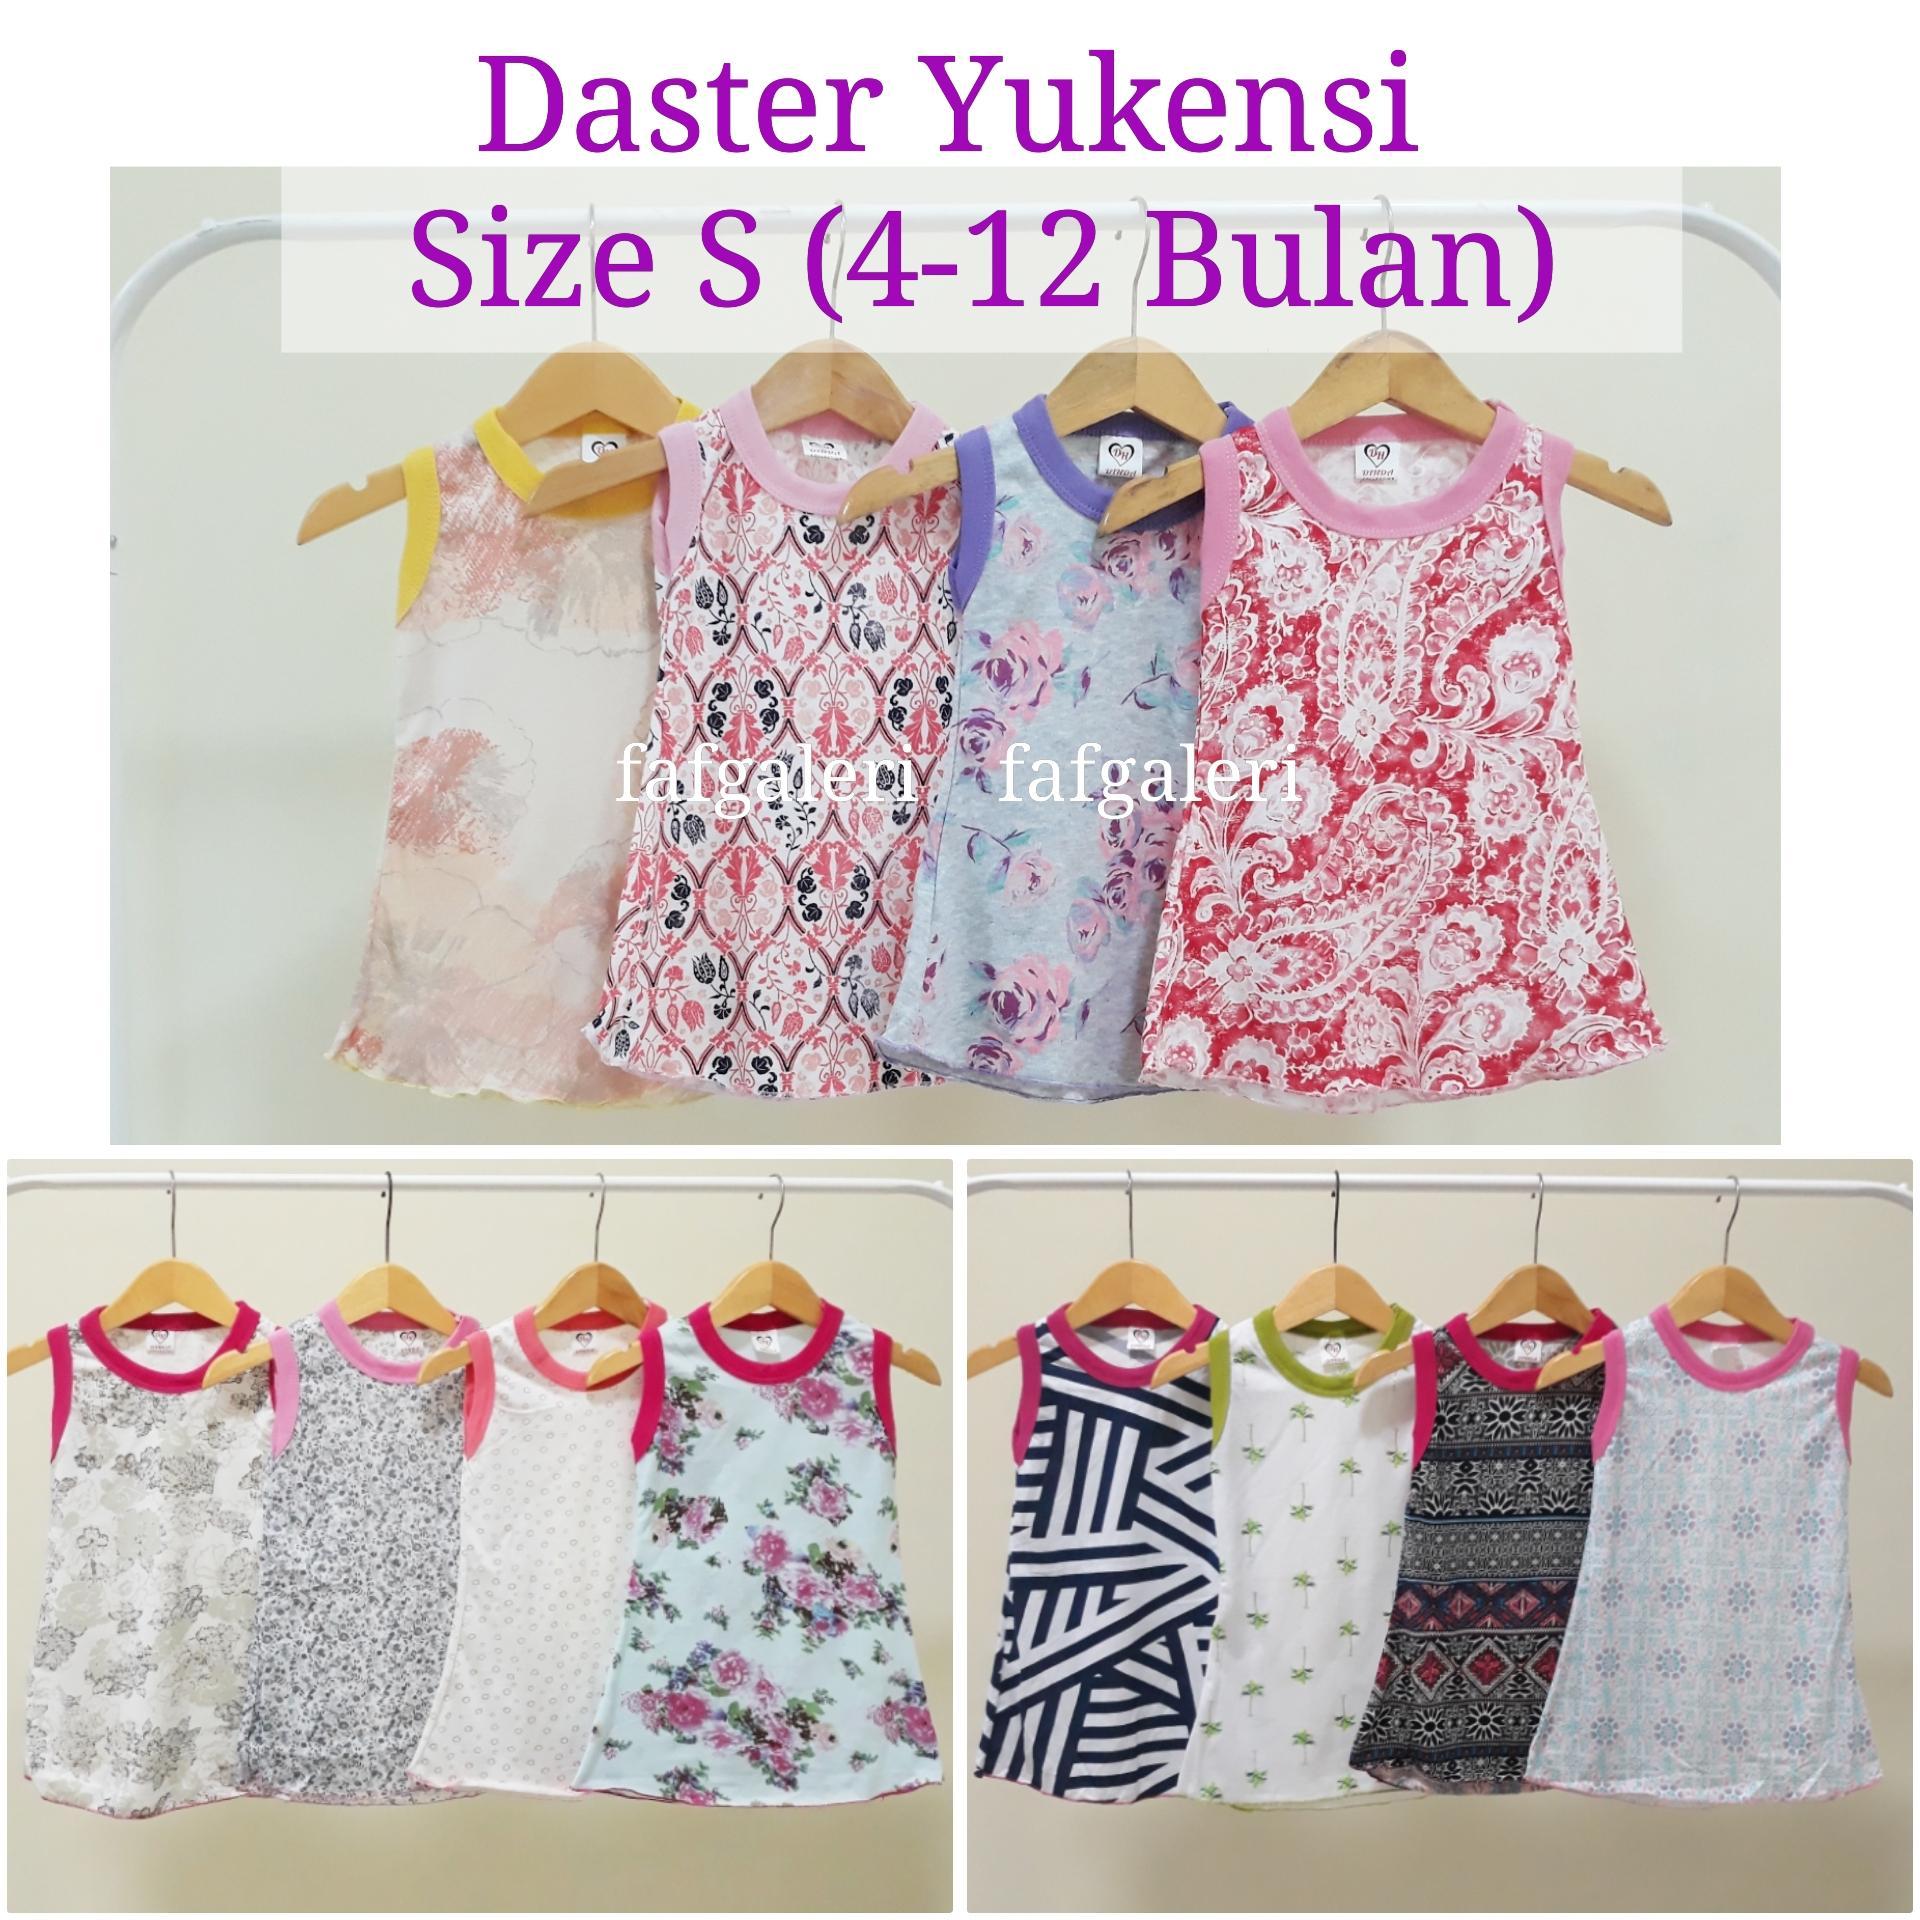 Daster Anak Yukensi 4-12 Bulan - Pakai Baju Anak Bayi Perempuan Harga  Grosir Murah fc50d8d9cb